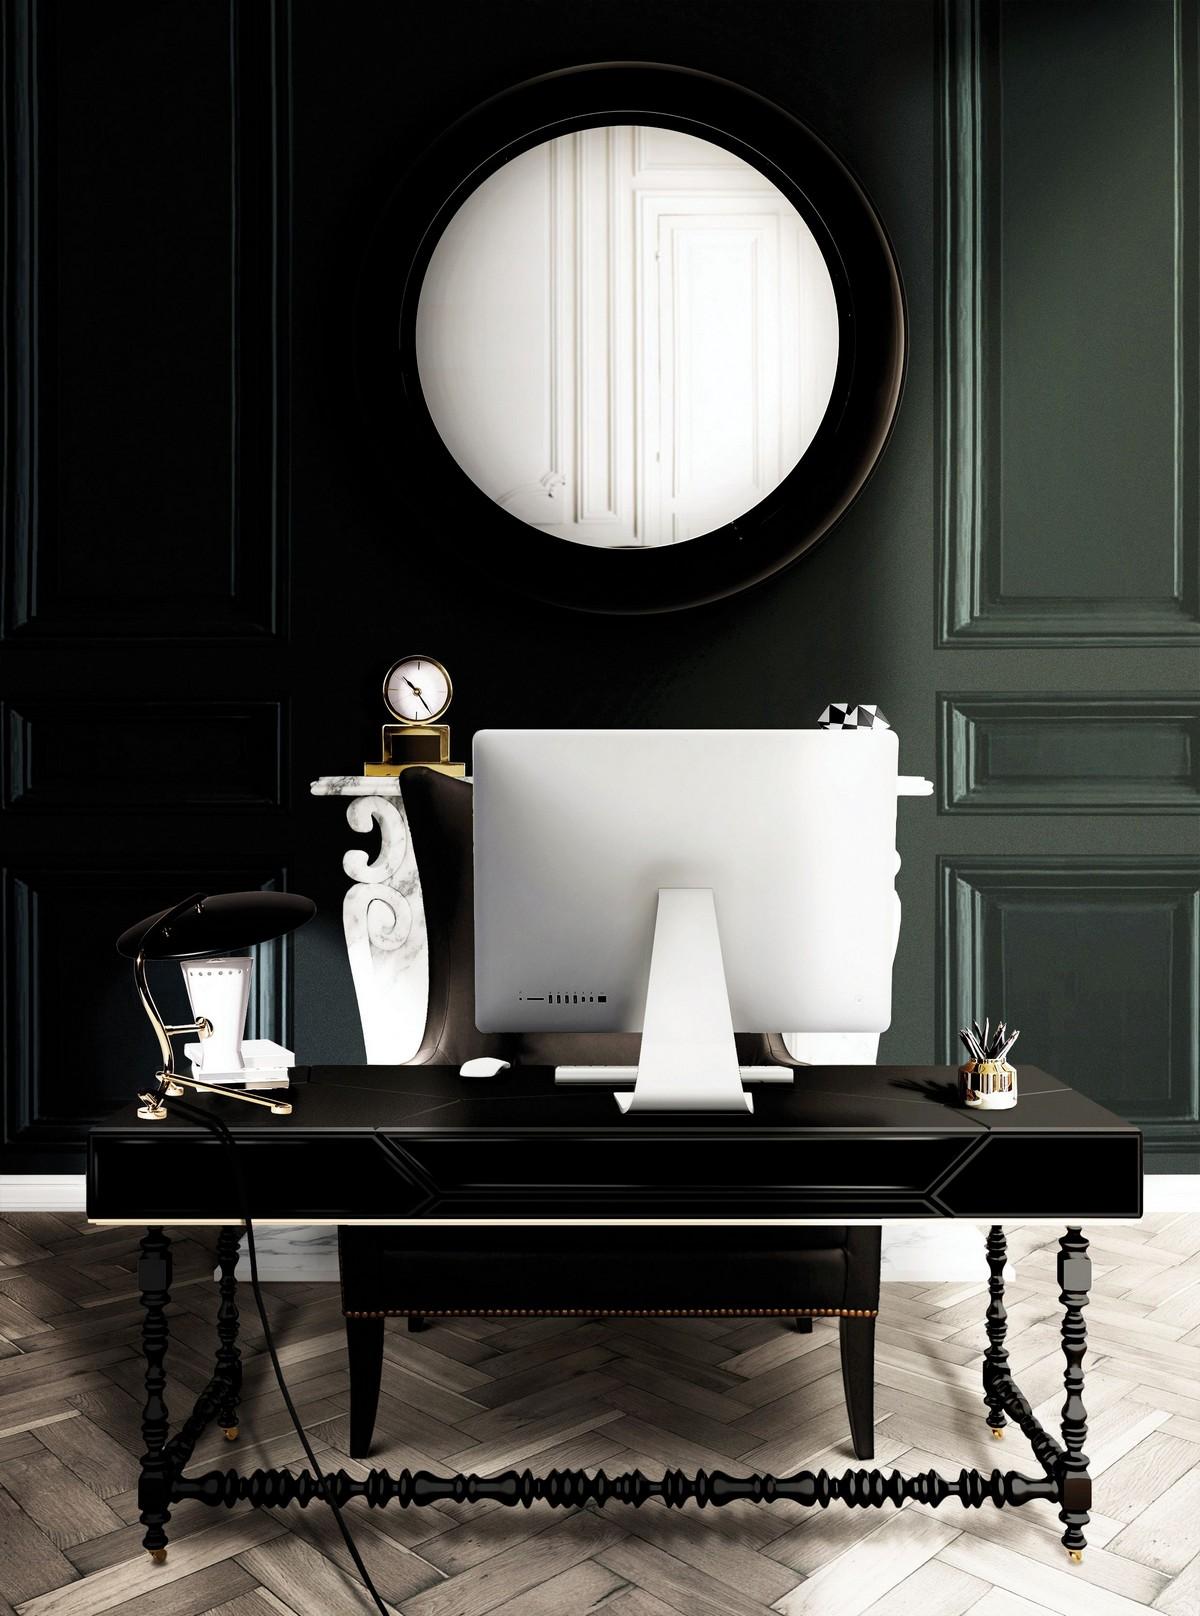 Top Bespoke Luxury Desks luxury desks Top Bespoke Luxury Desks manu